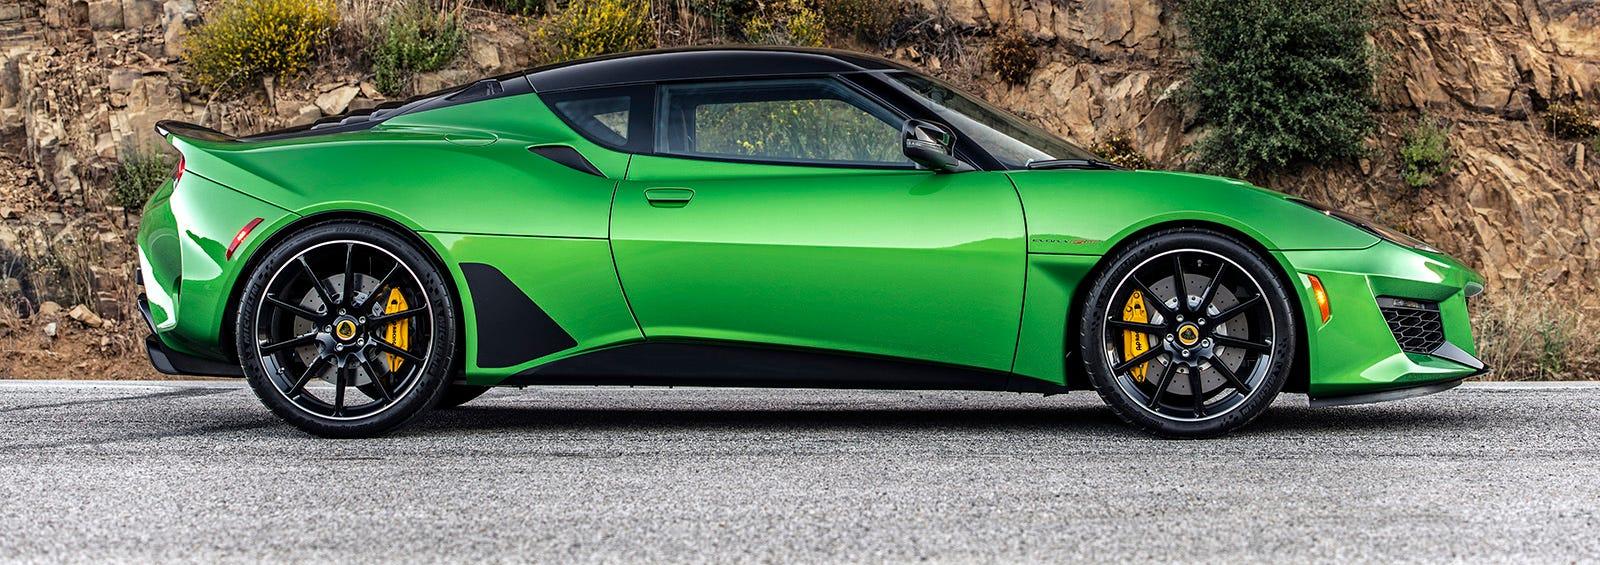 Why The 2020 Lotus Evora GT Feels Like A Uniquely Futuristic Relic